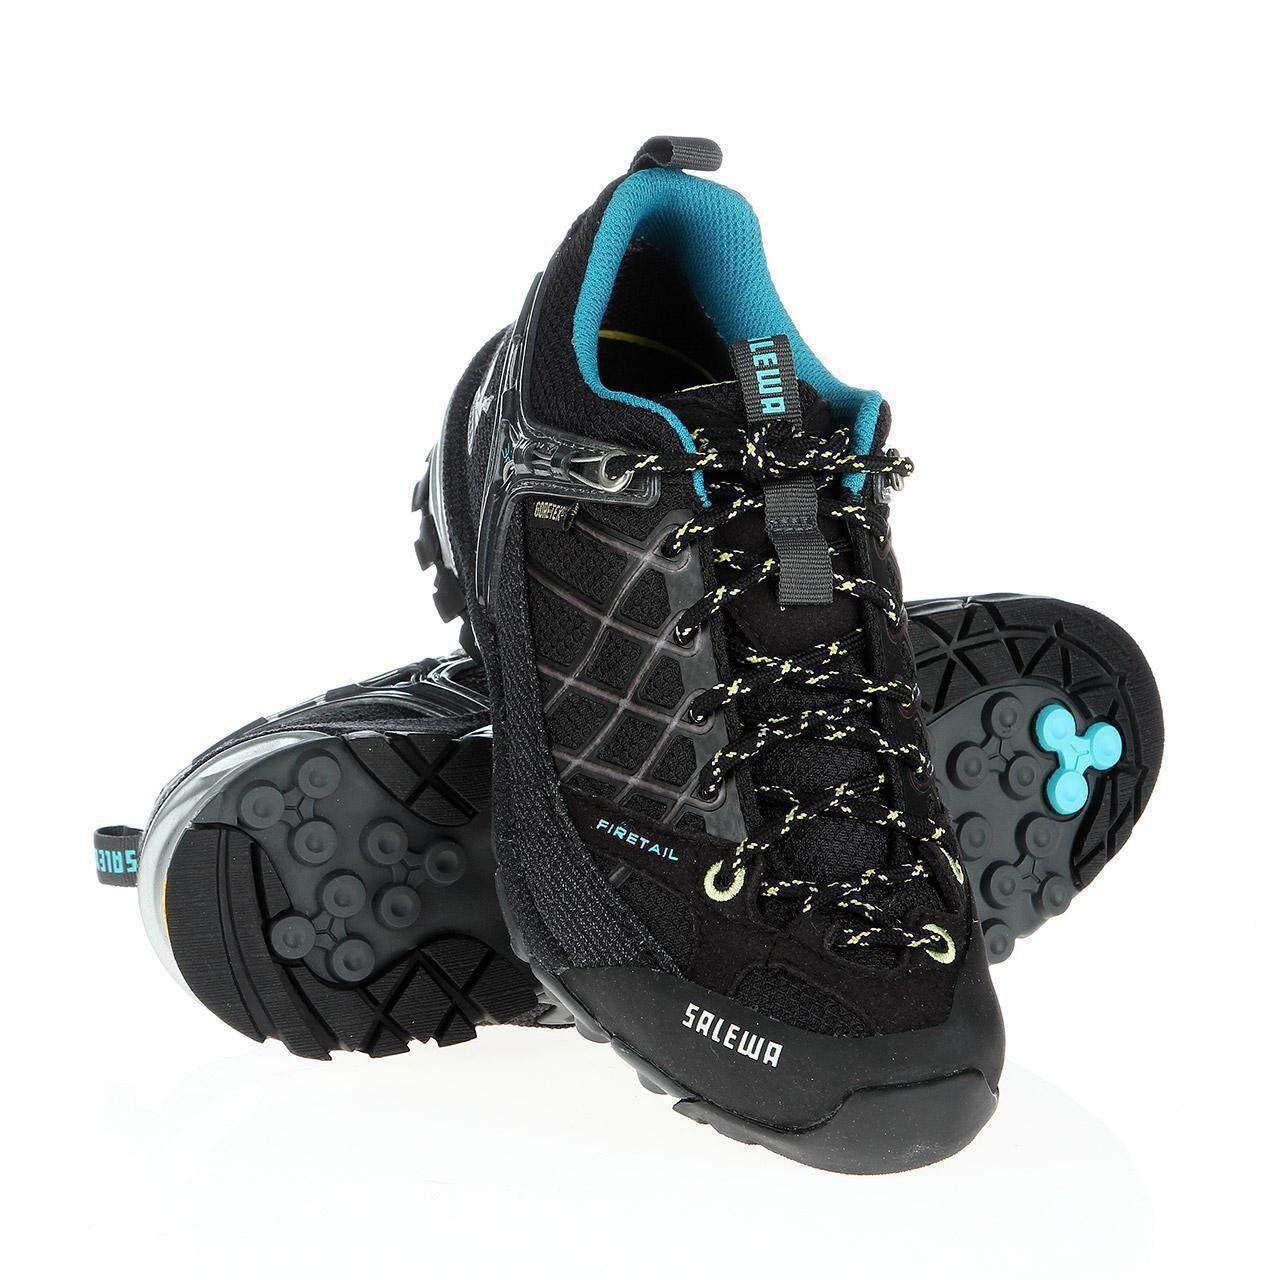 Salewa FIRETAIL damen Hiking Trekking zustiegs schuhe Waterproof Gore-Tex READ